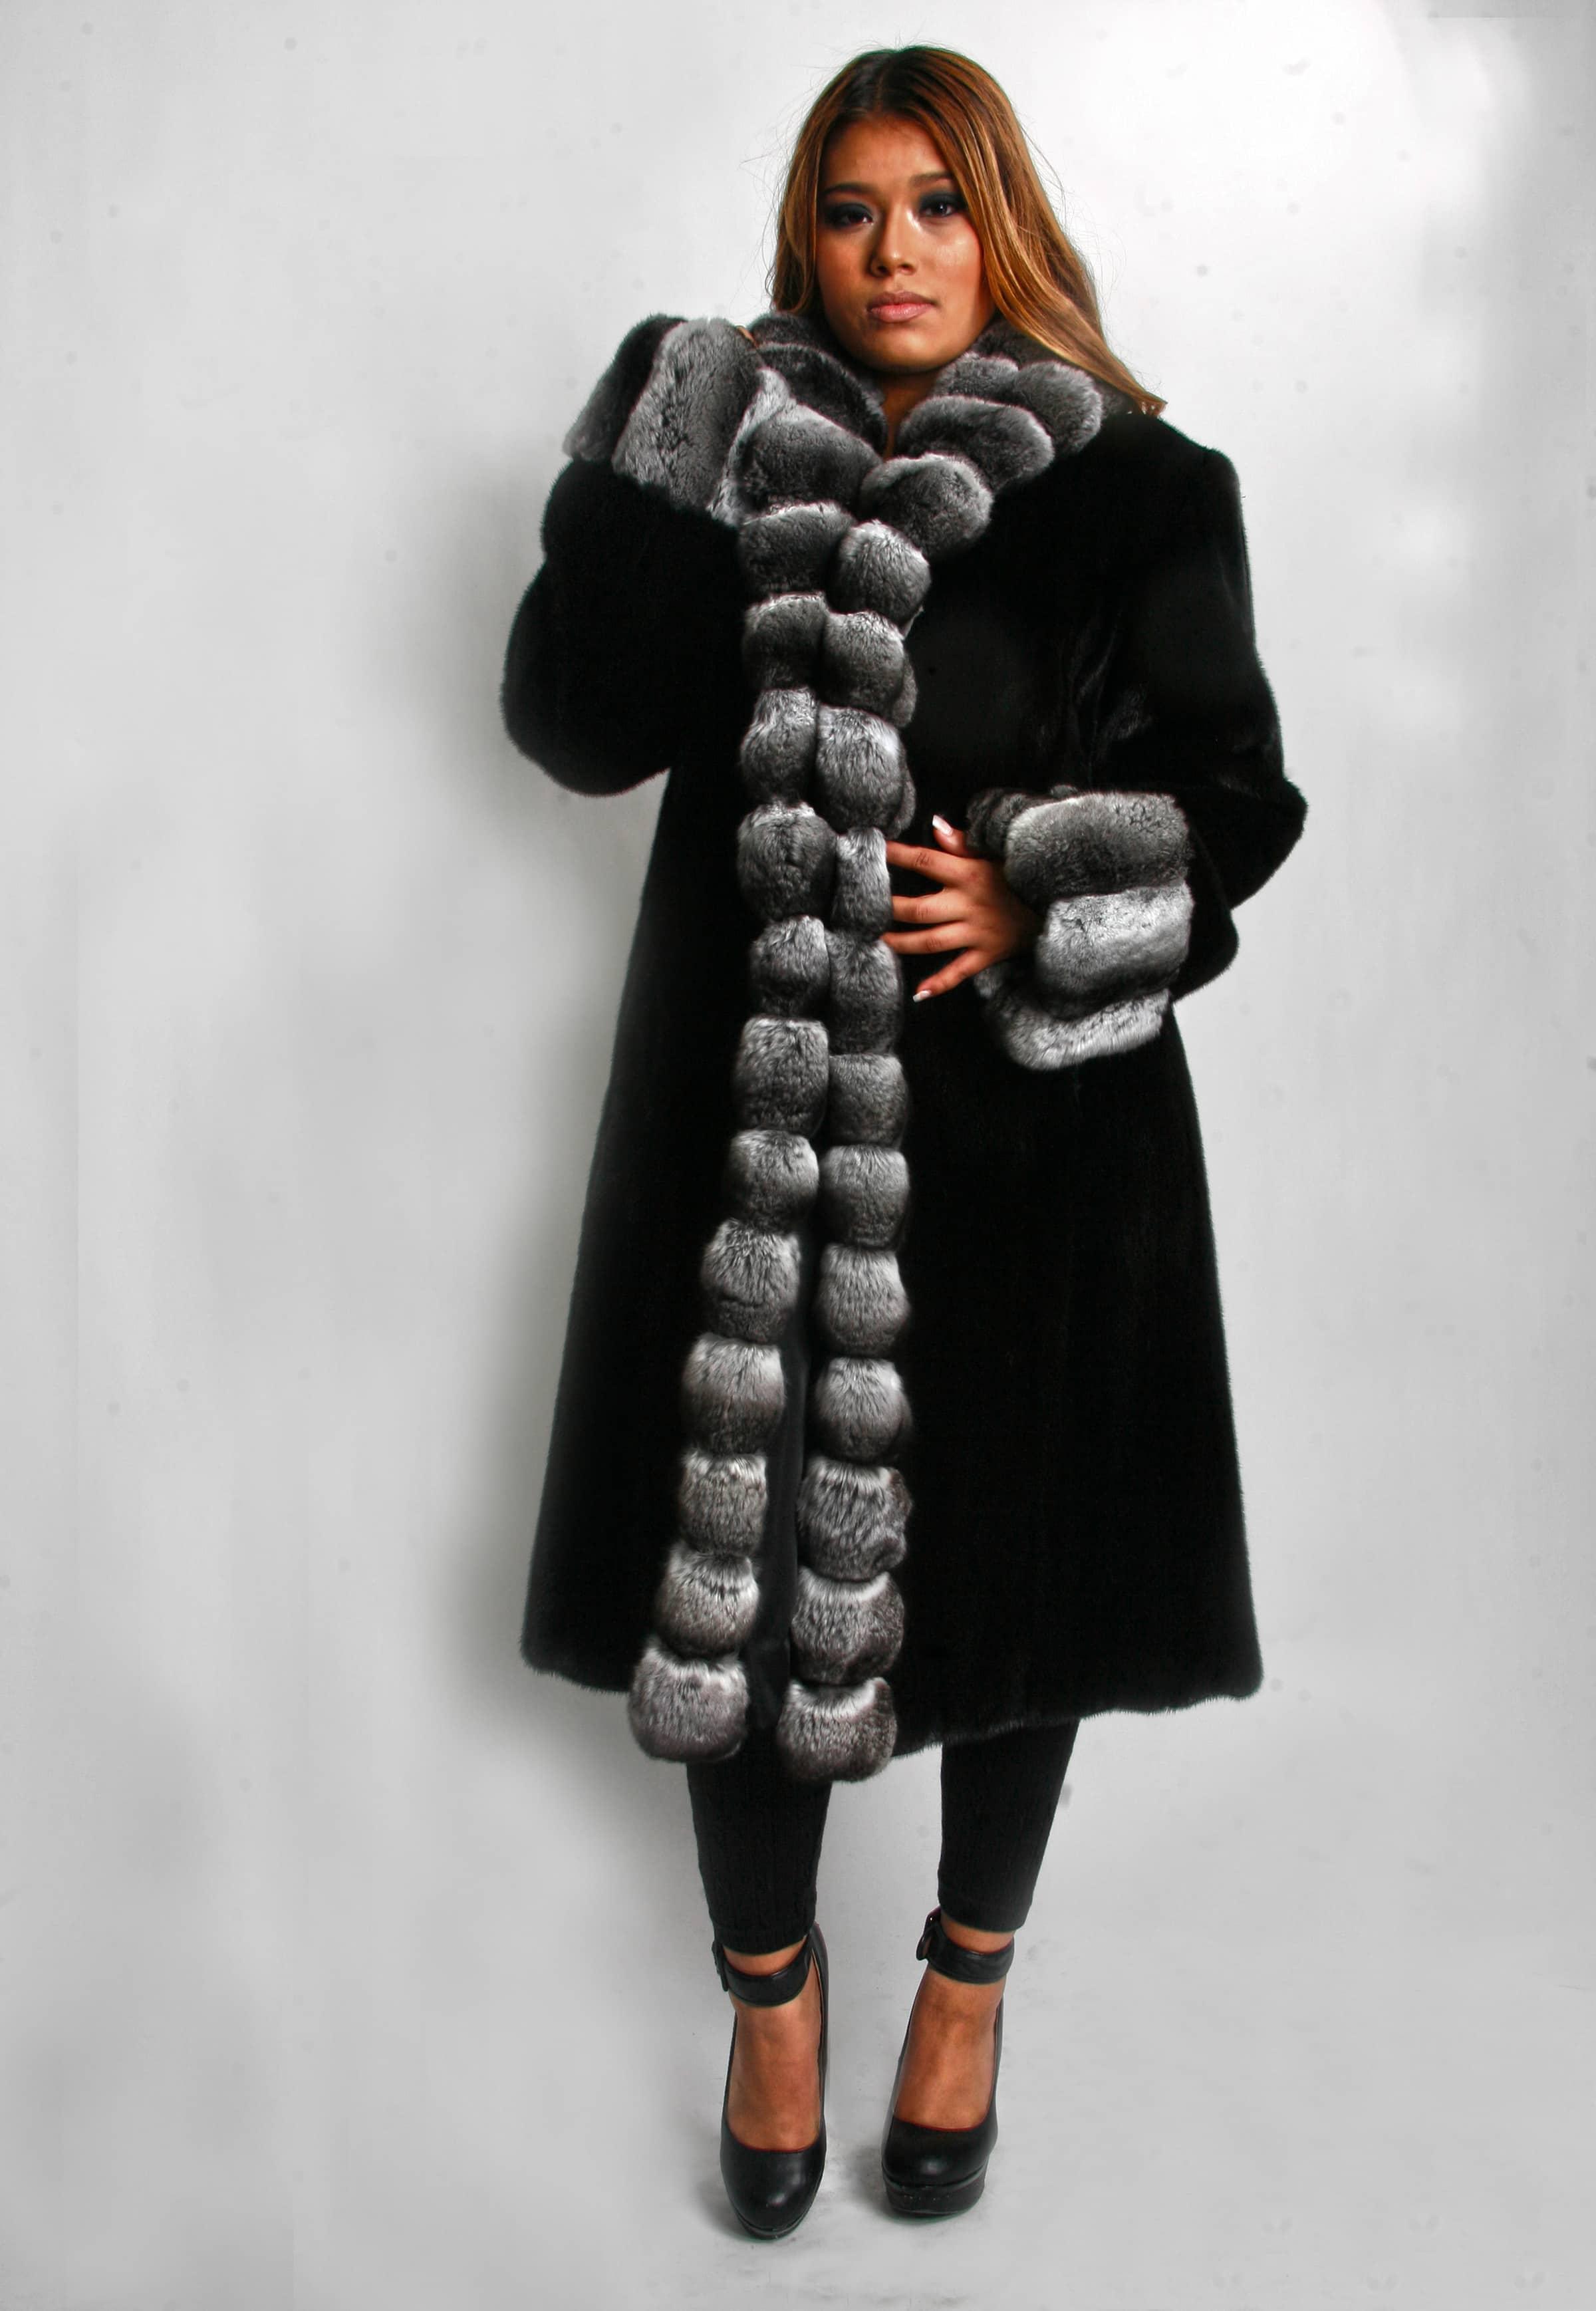 Fur Fashion Statement